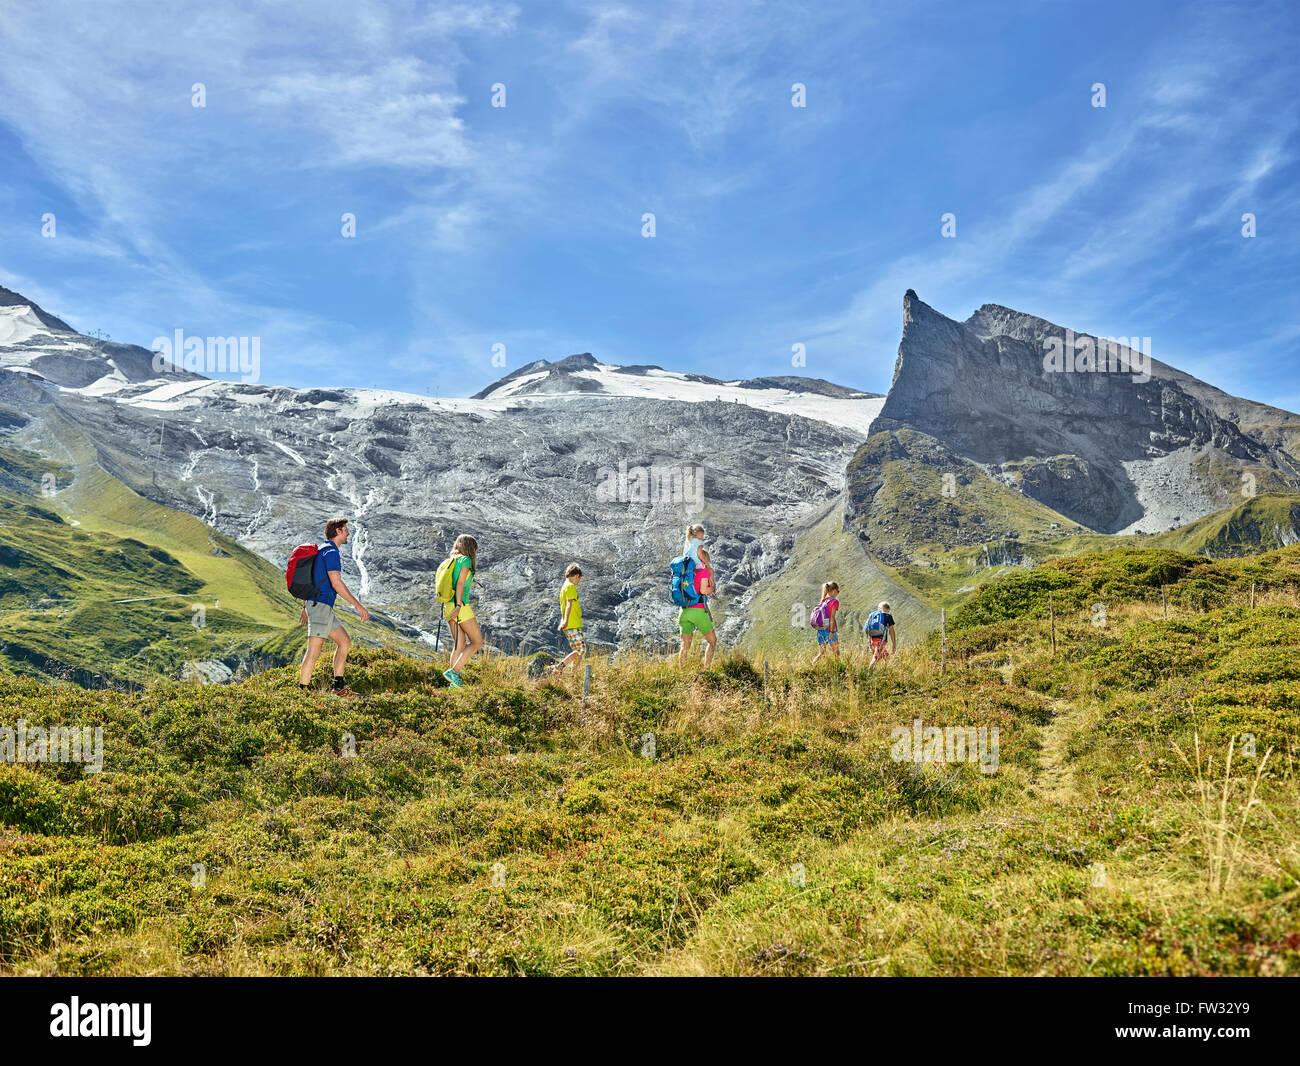 Familia con cinco niños senderismo en frente de un paisaje de montaña, Mijdrecht, Zillertal, Tirol, Austria Foto de stock